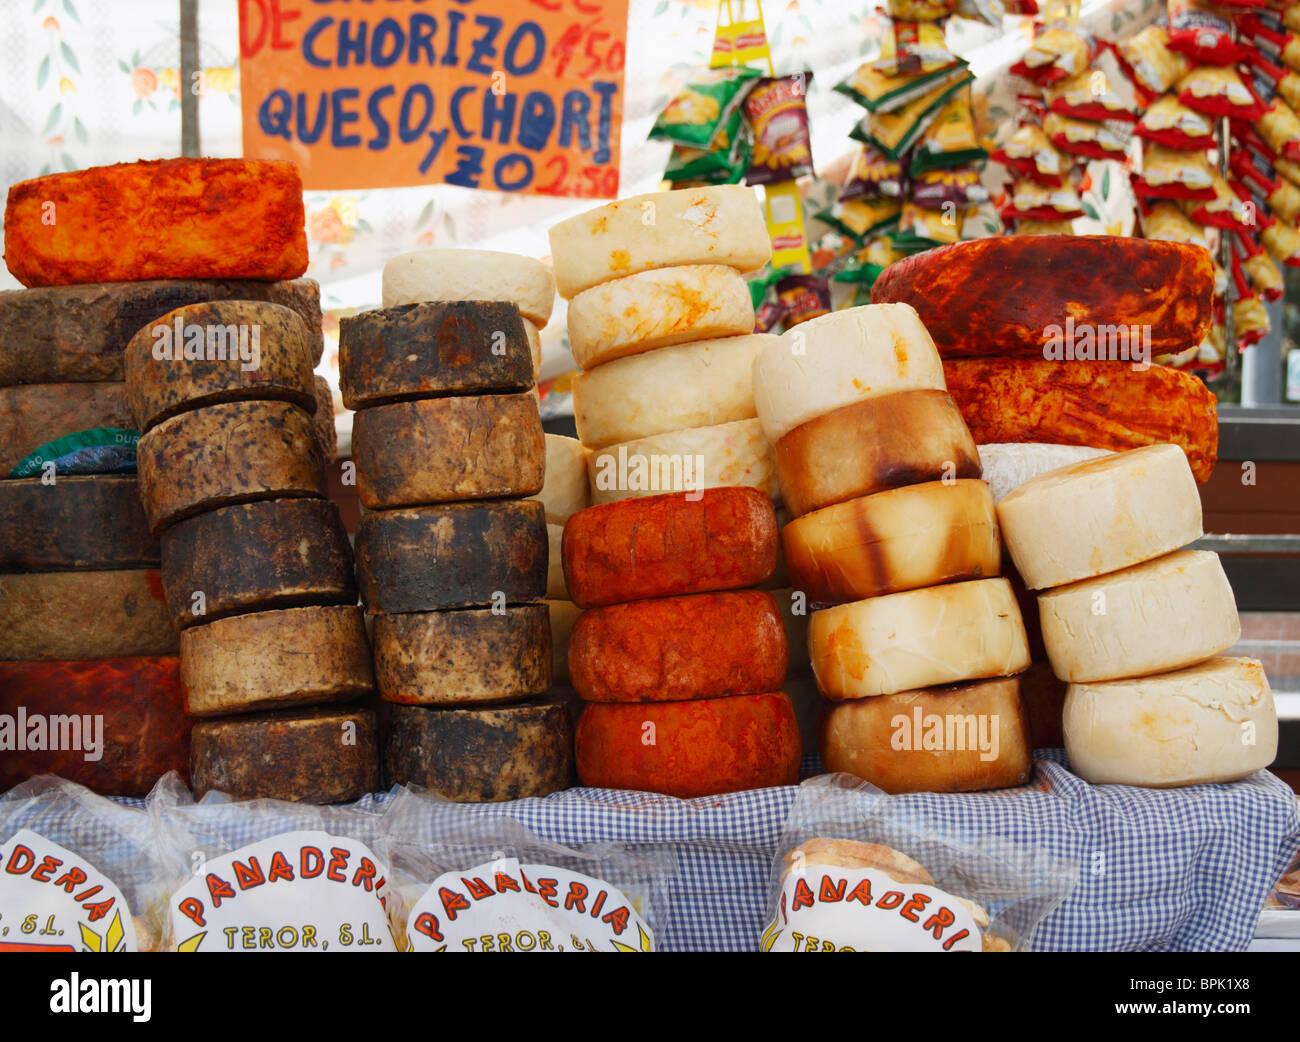 Käse am Marktstand in Teror auf Gran Canaria Stockbild